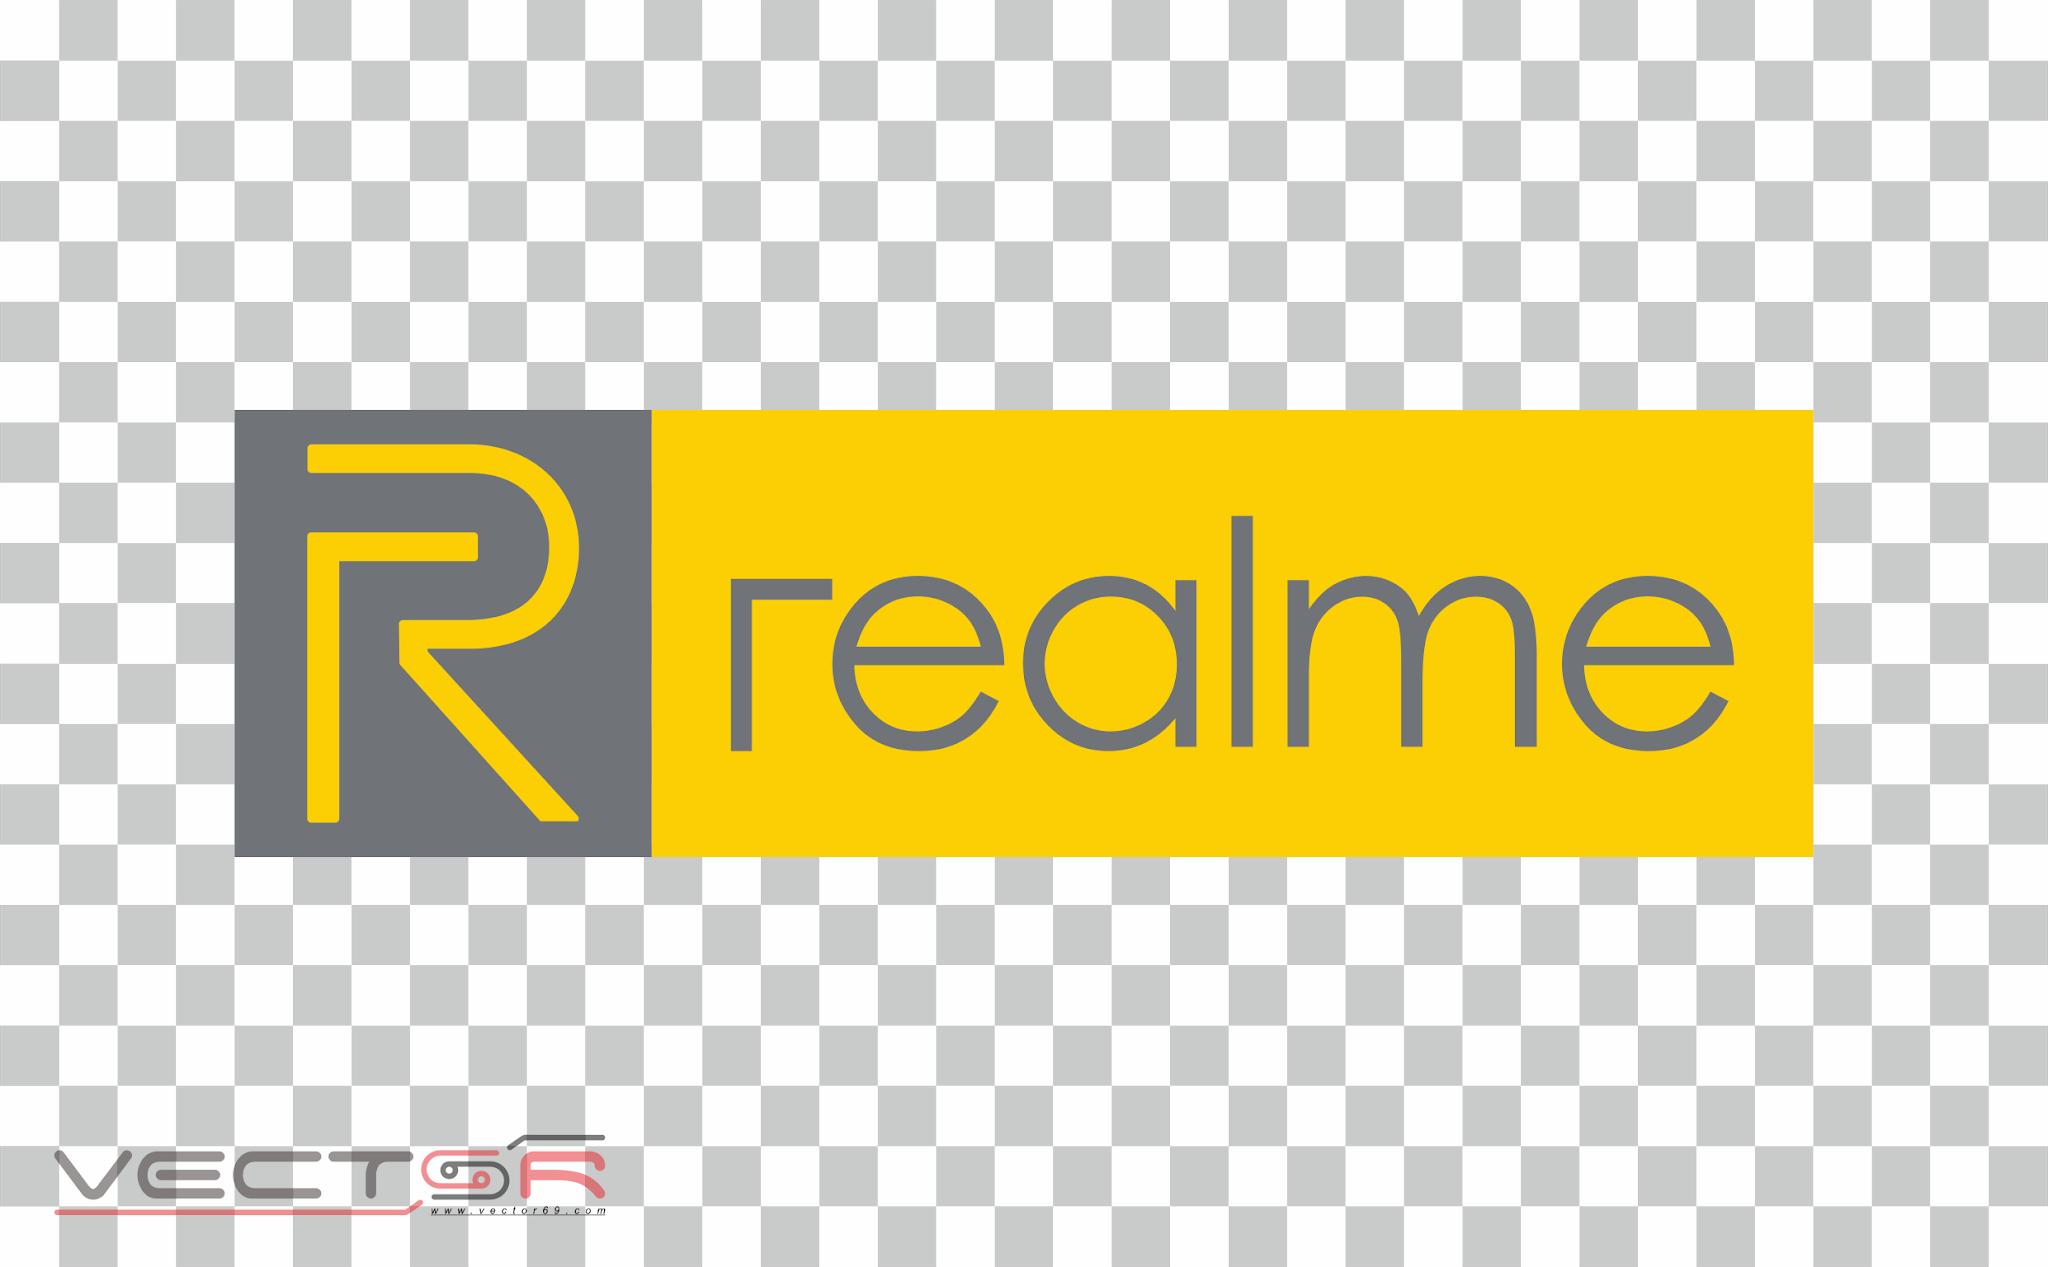 Realme Logo - Download Vector File PNG (Portable Network Graphics)